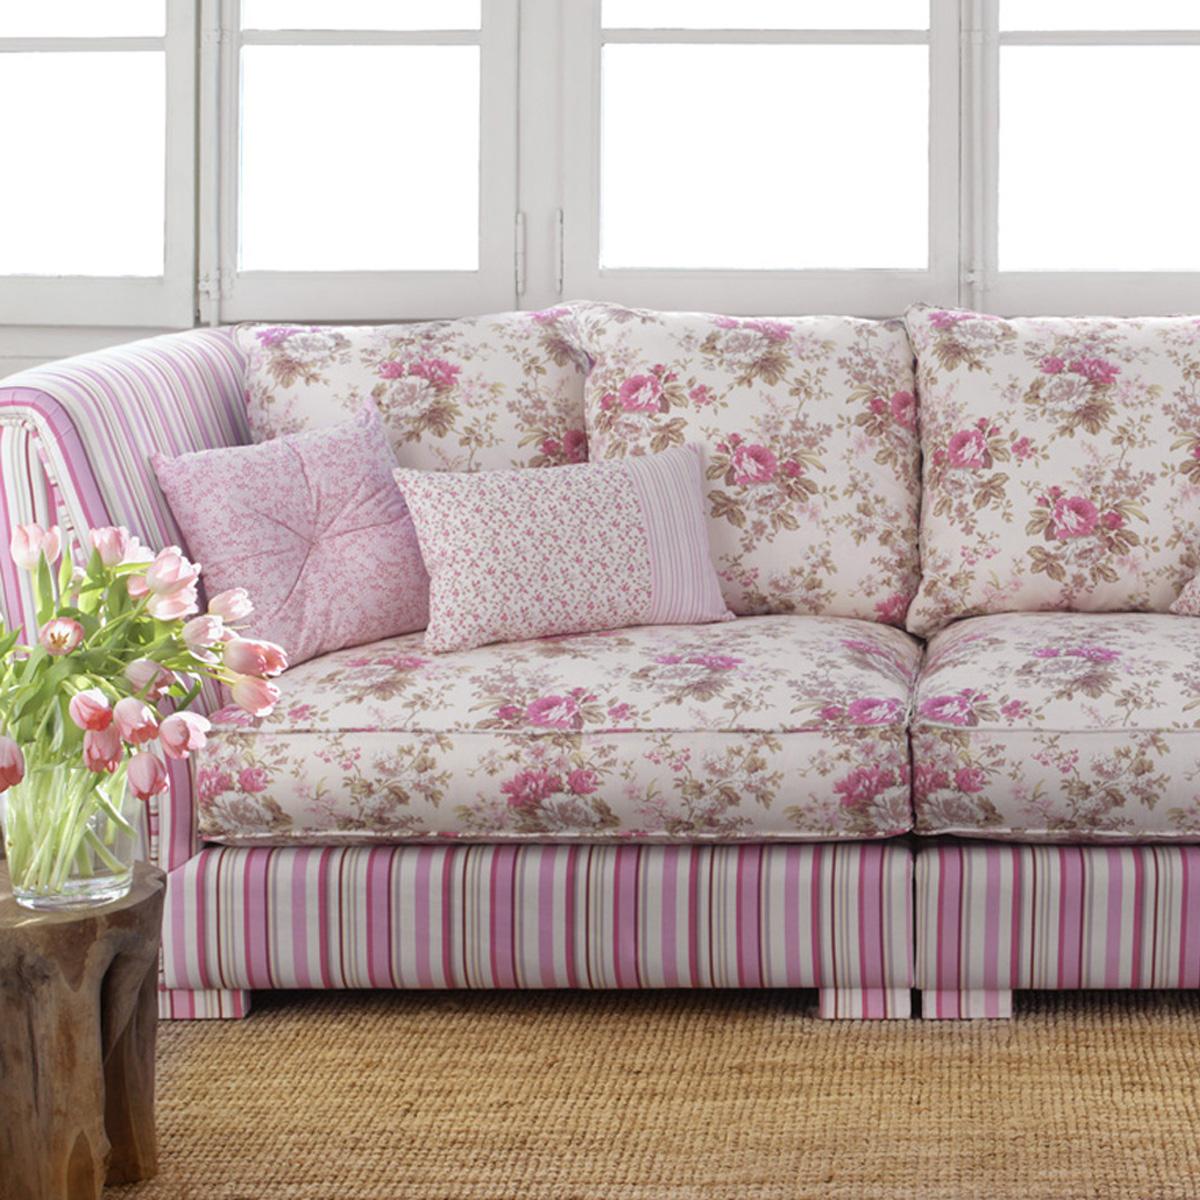 301 moved permanently - Tapizados de sofas ...